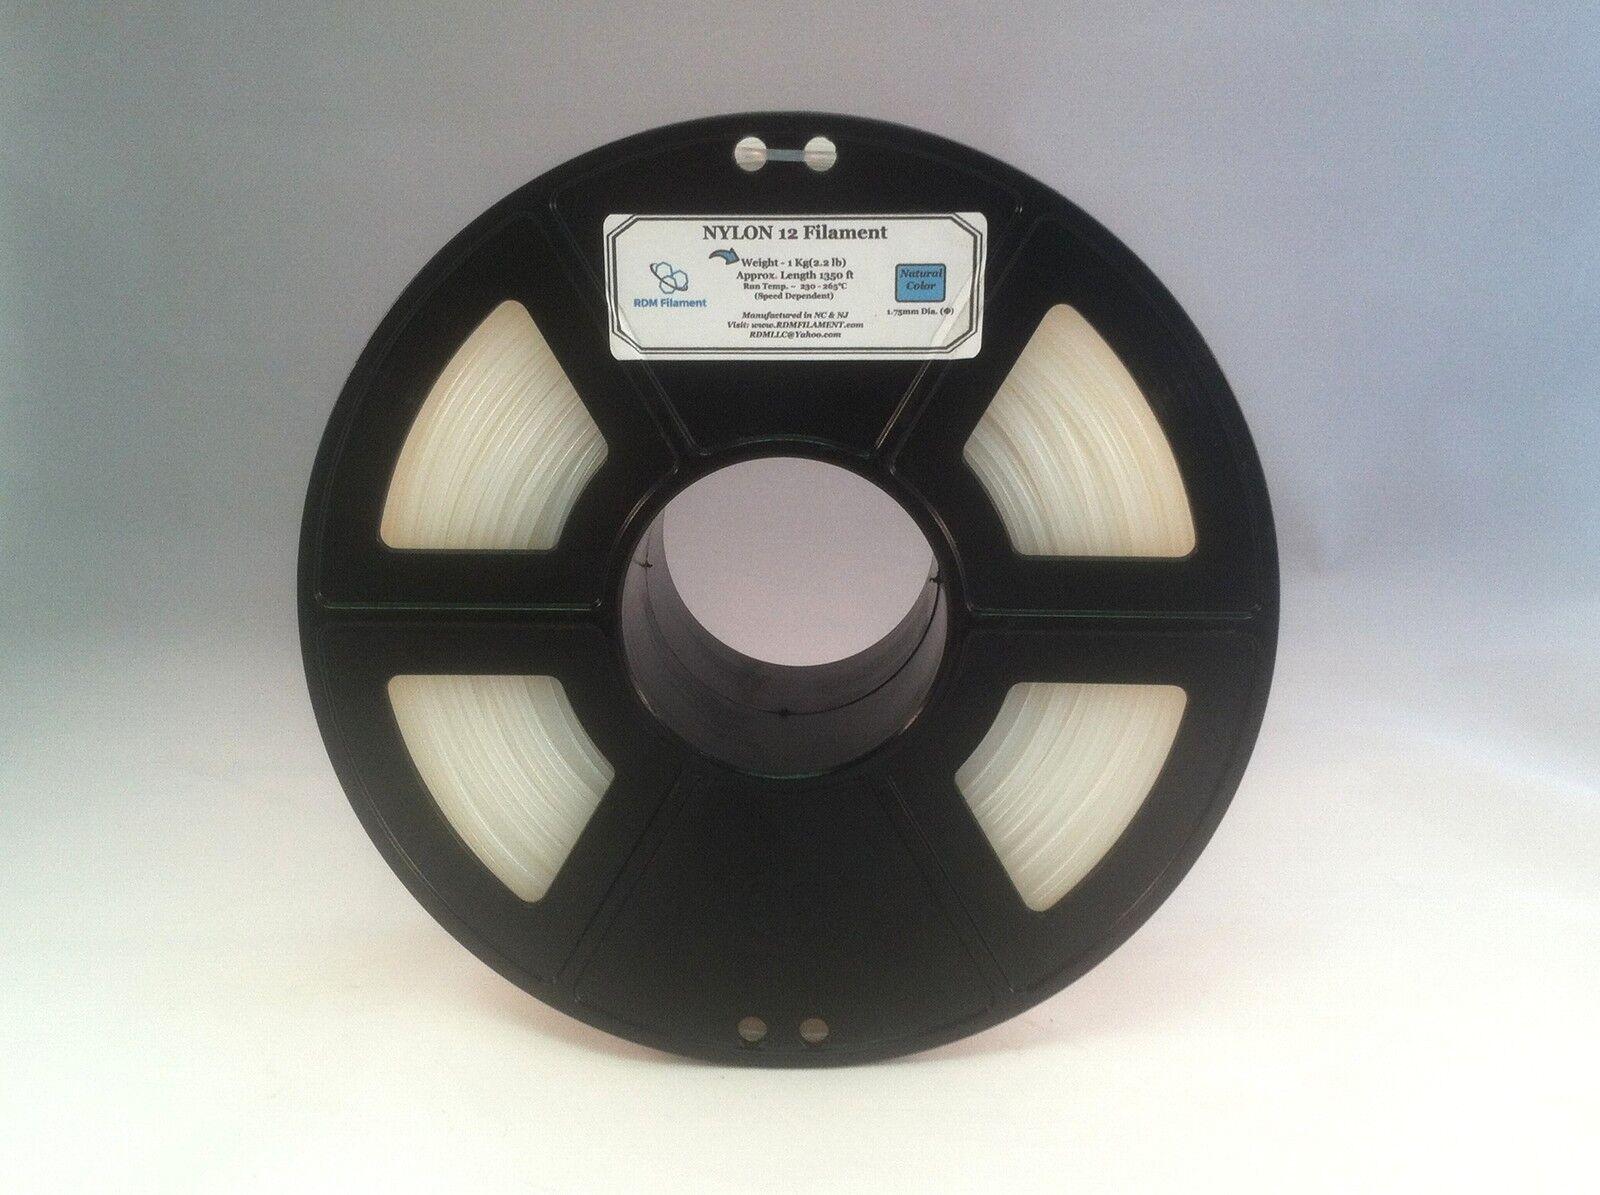 Nylon 12 Filament 1KG   HUGE PRICE DROP   + FREE 5ml sample of FUBAR GLUE!!!